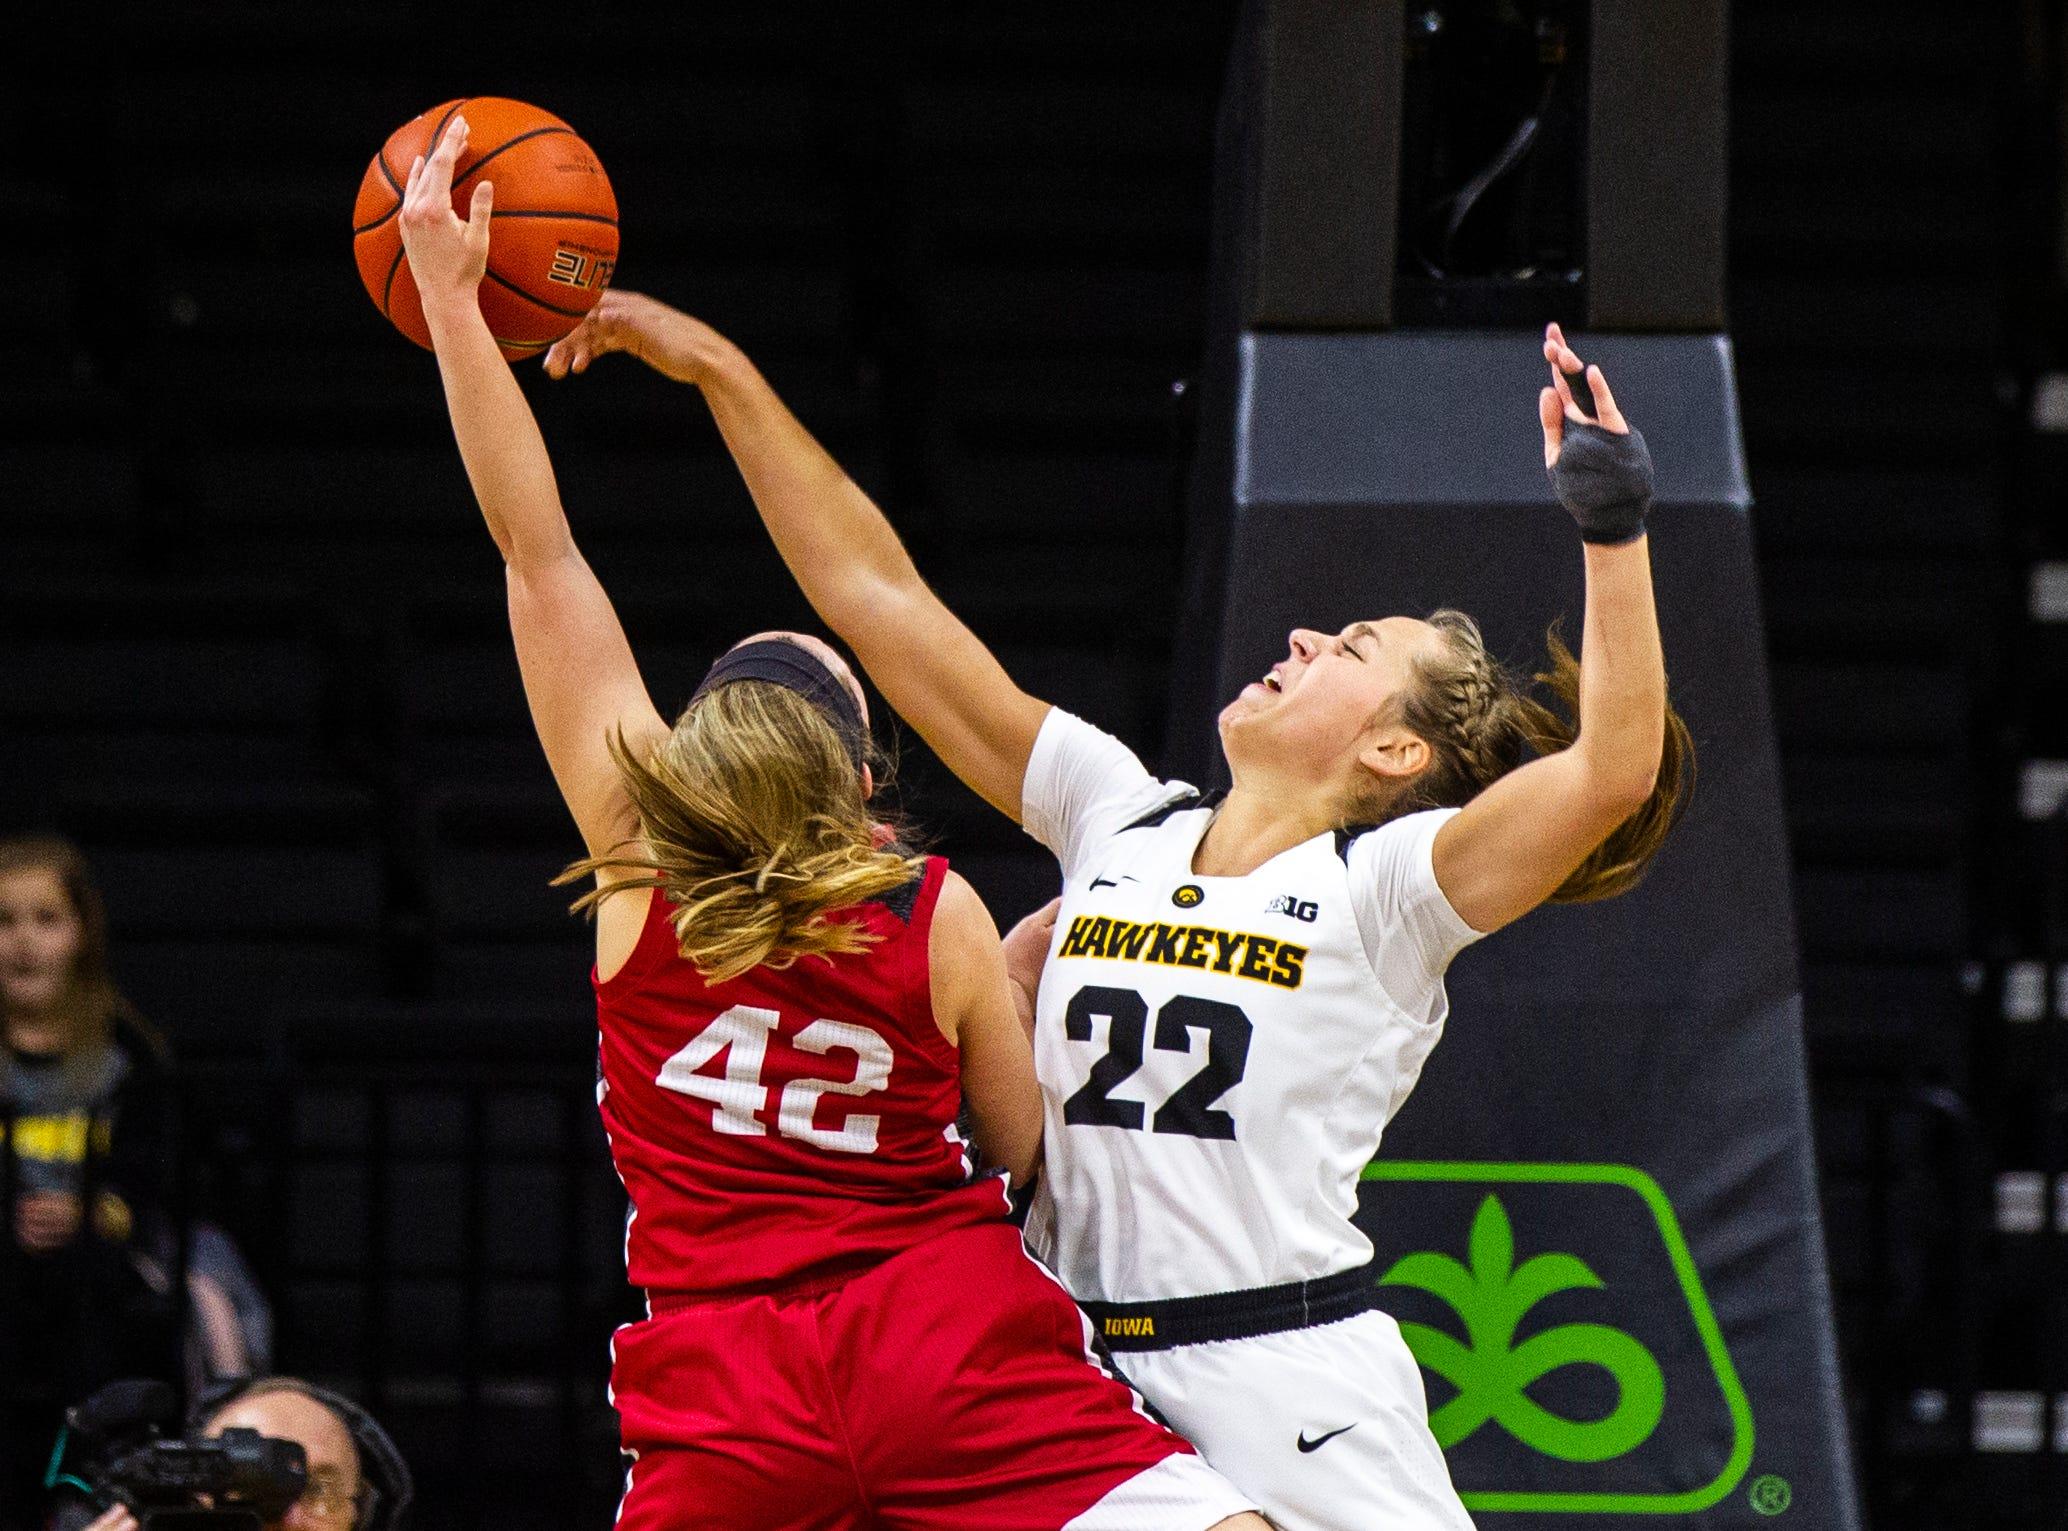 Iowa guard Kathleen Doyle (22) blocks IUPUI guard Sydney Hall's shot during a NCAA women's basketball game on Saturday, Dec. 8, 2018, at Carver-Hawkeye Arena in Iowa City.